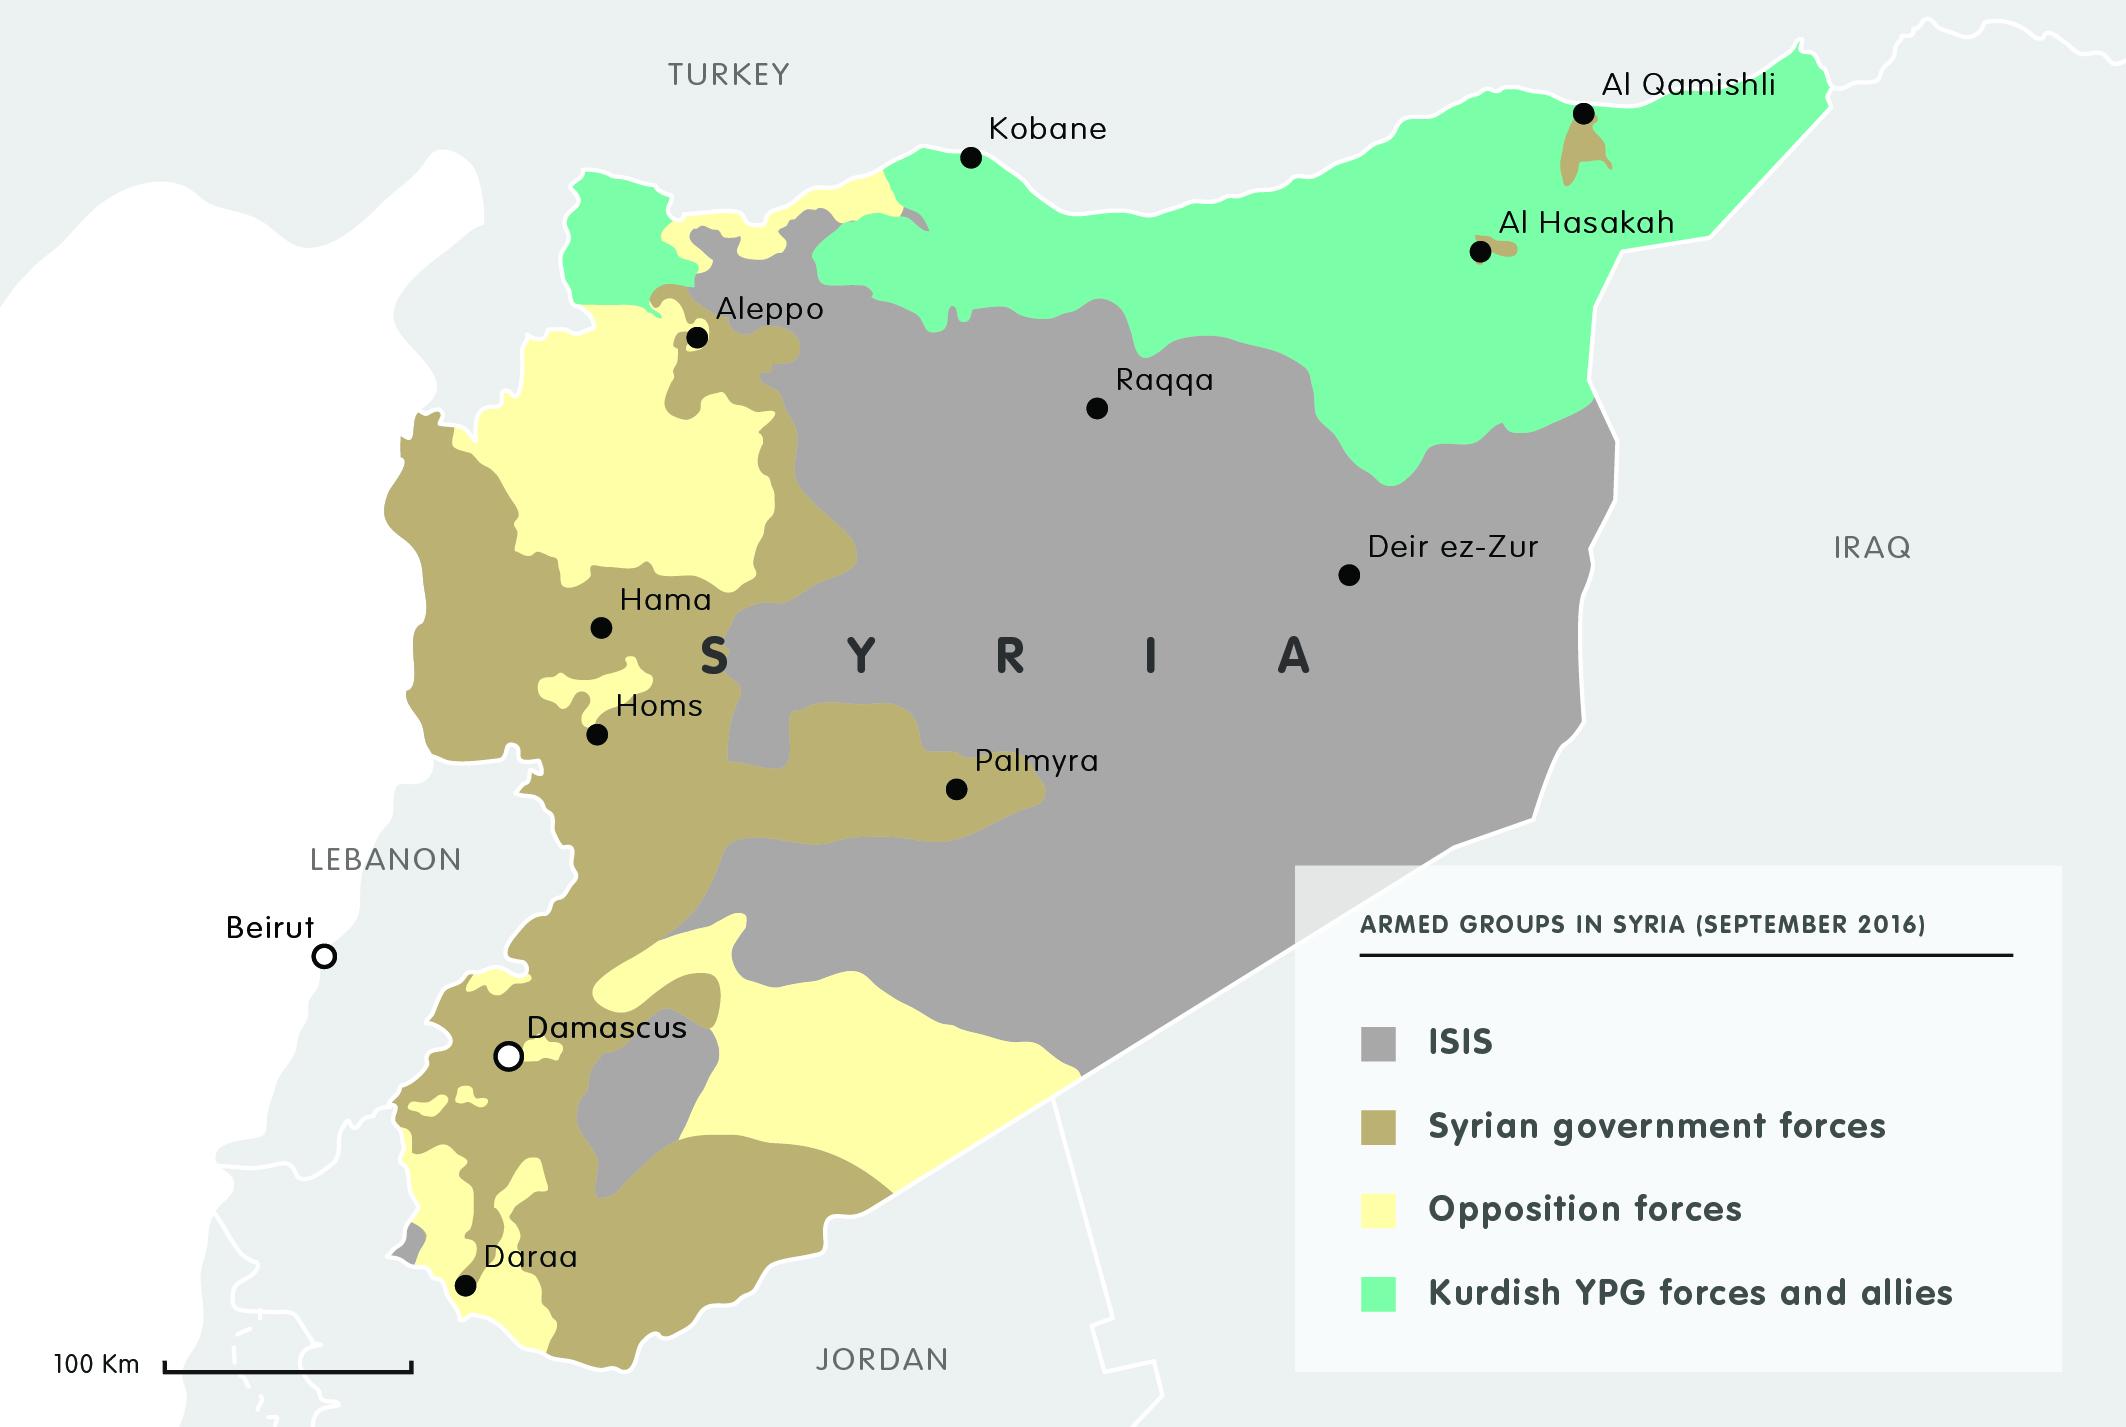 Armed groups in Syria (September 2016)